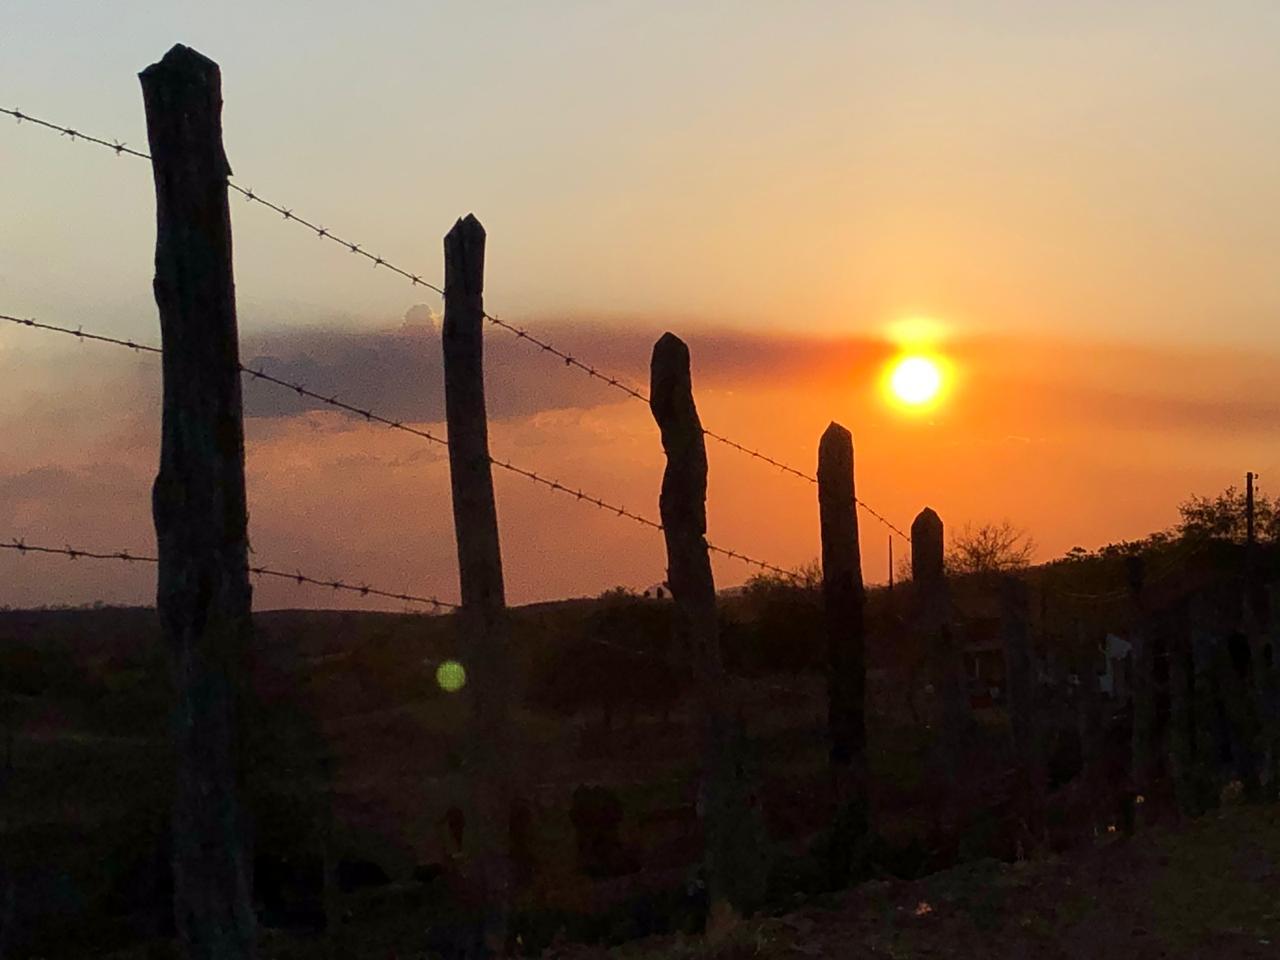 Tempo seco no interior deve predominar neste fim de semana (FOTO: Marciel Bezerra)